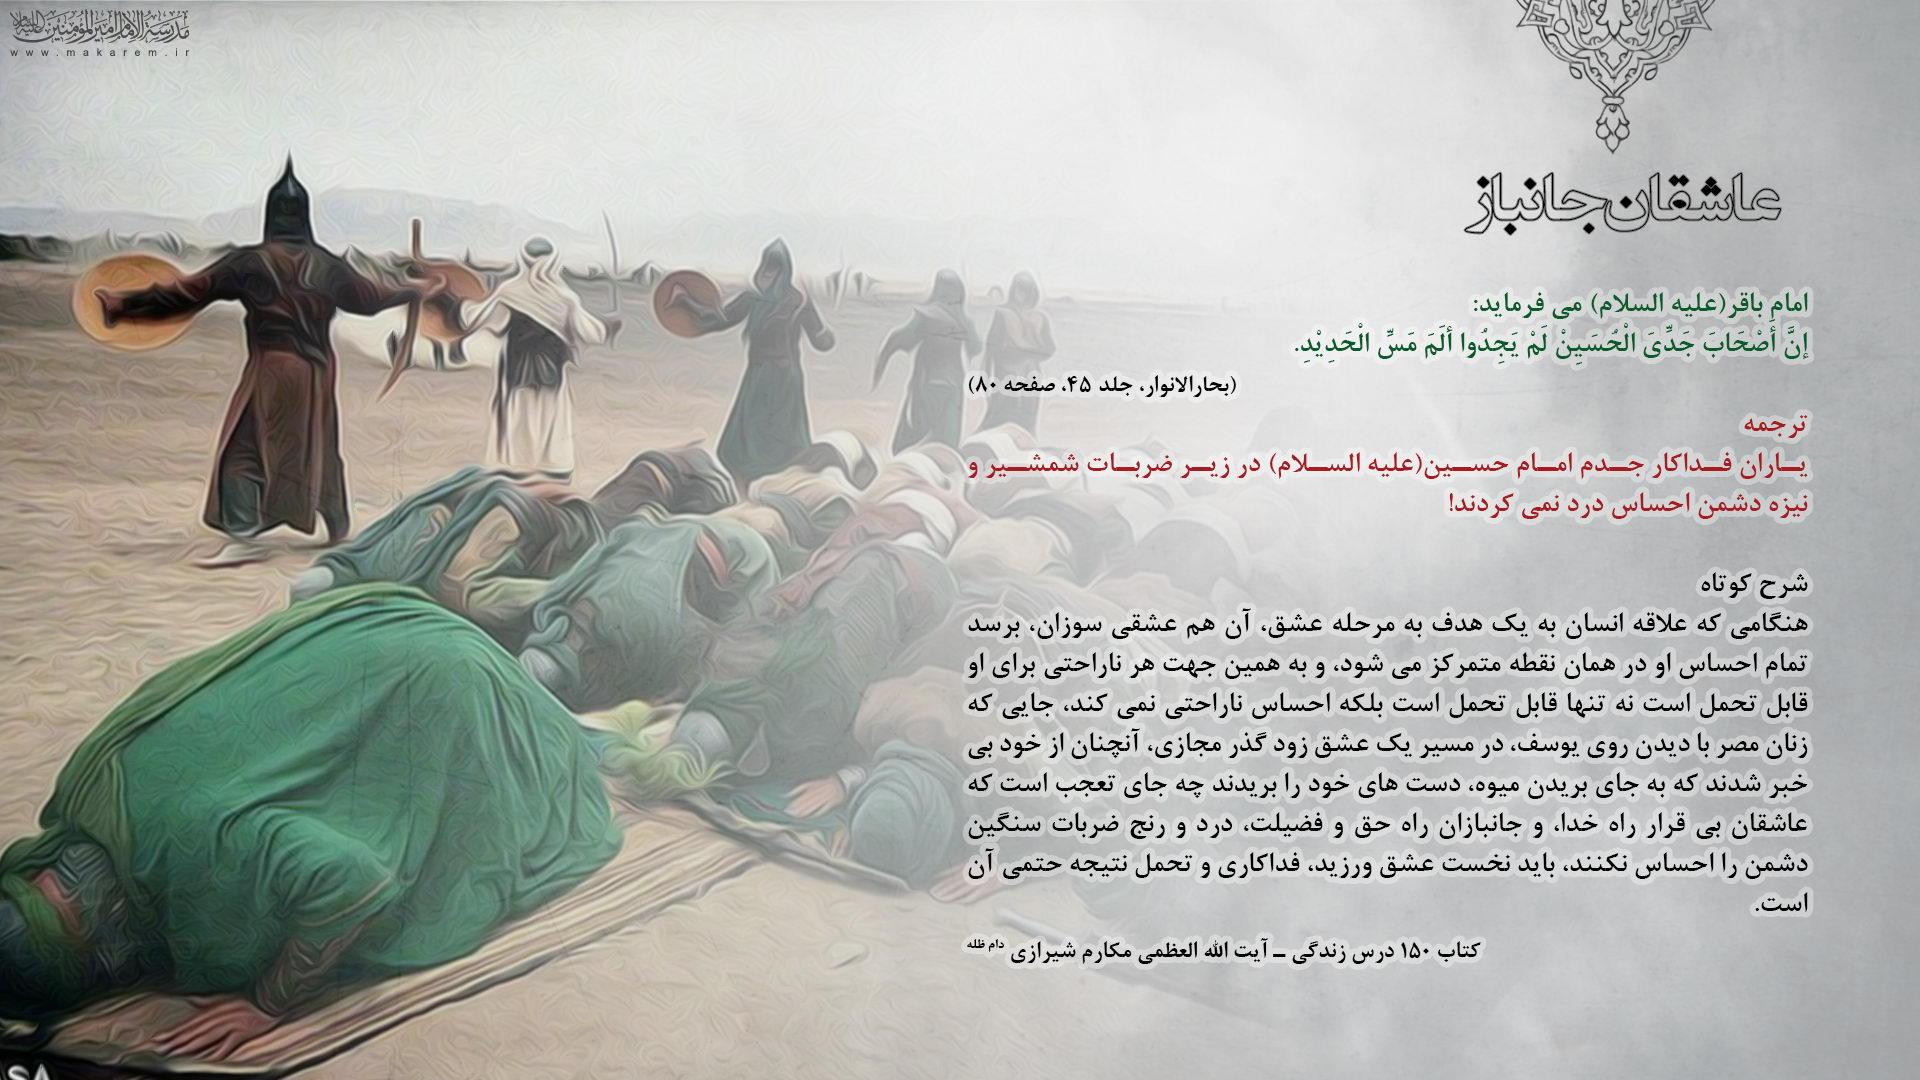 عاشقان جانباز-مدرسه الامام امیر المومنین (ع)